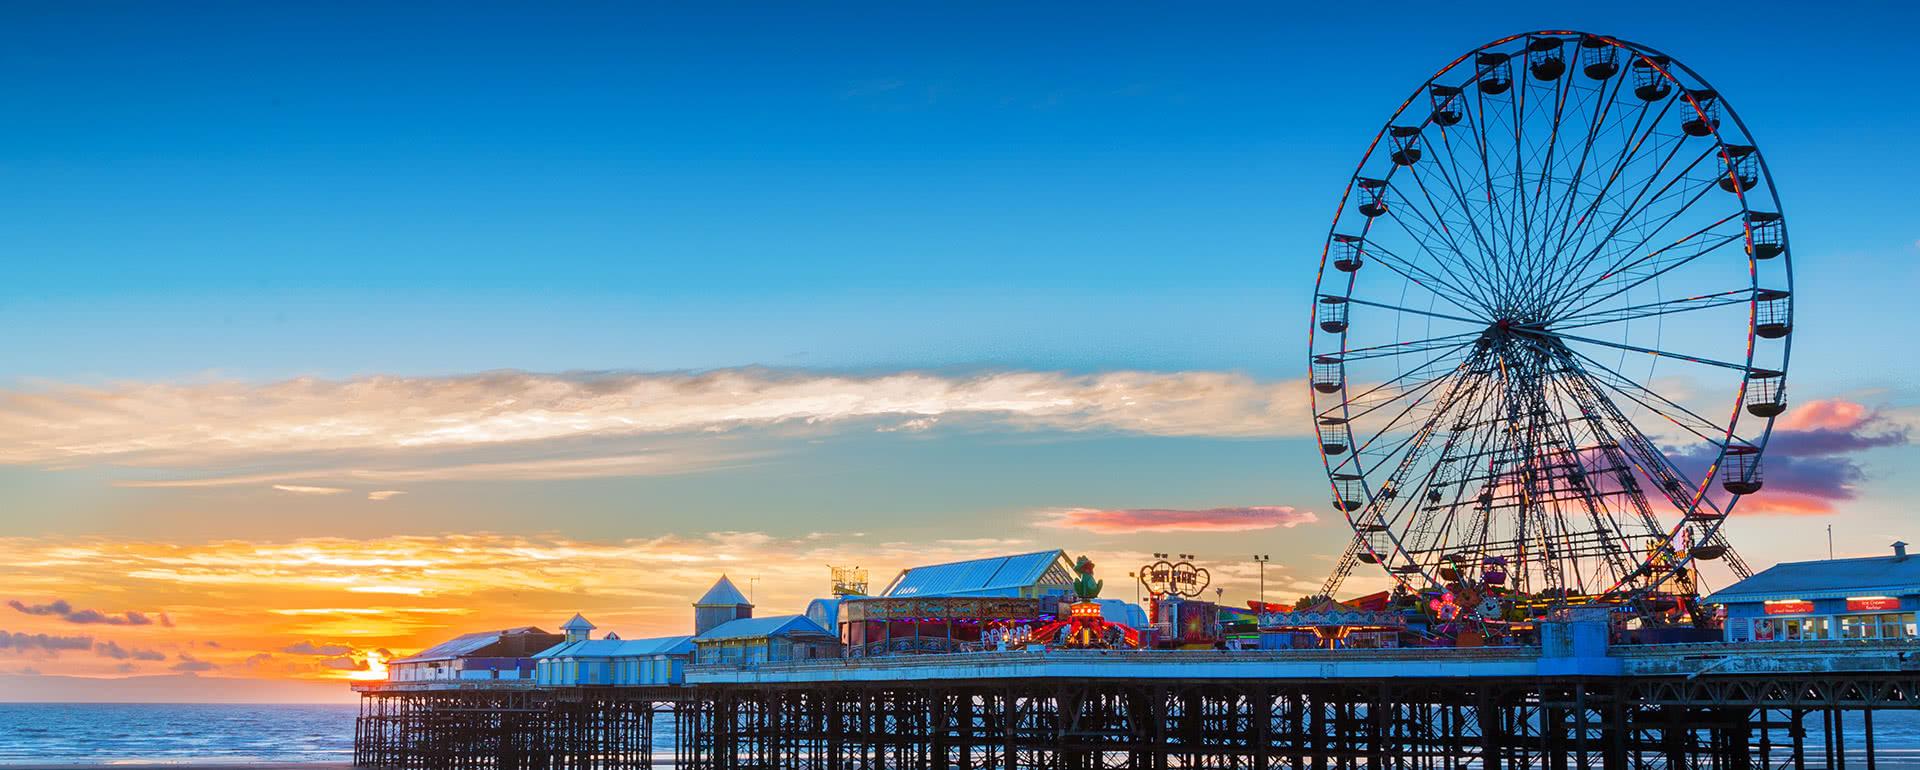 Titelbild von Blackpool